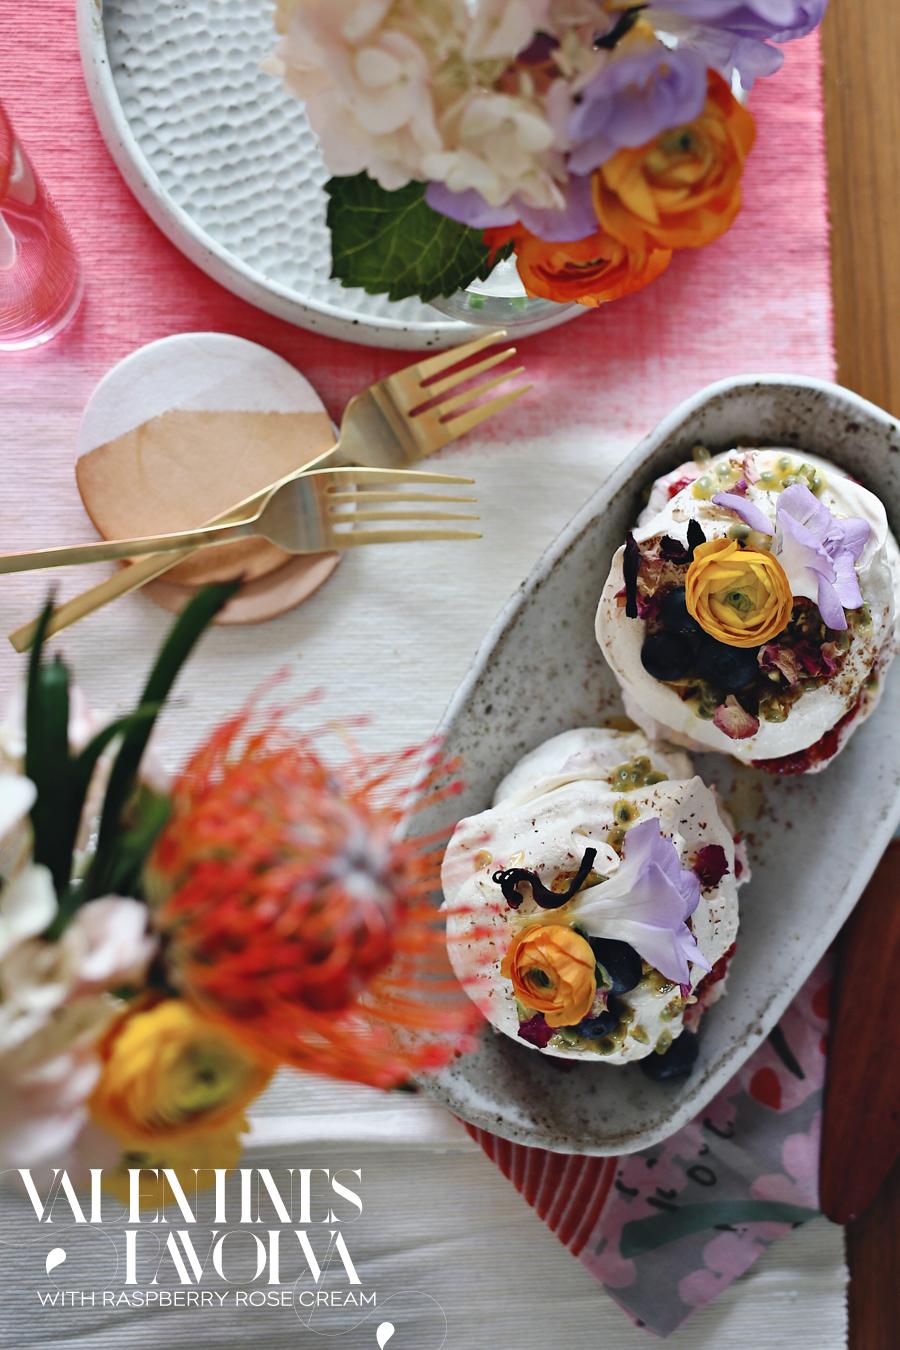 Valentines Pavlova With Raspberry Rose Cream   Dine X Design